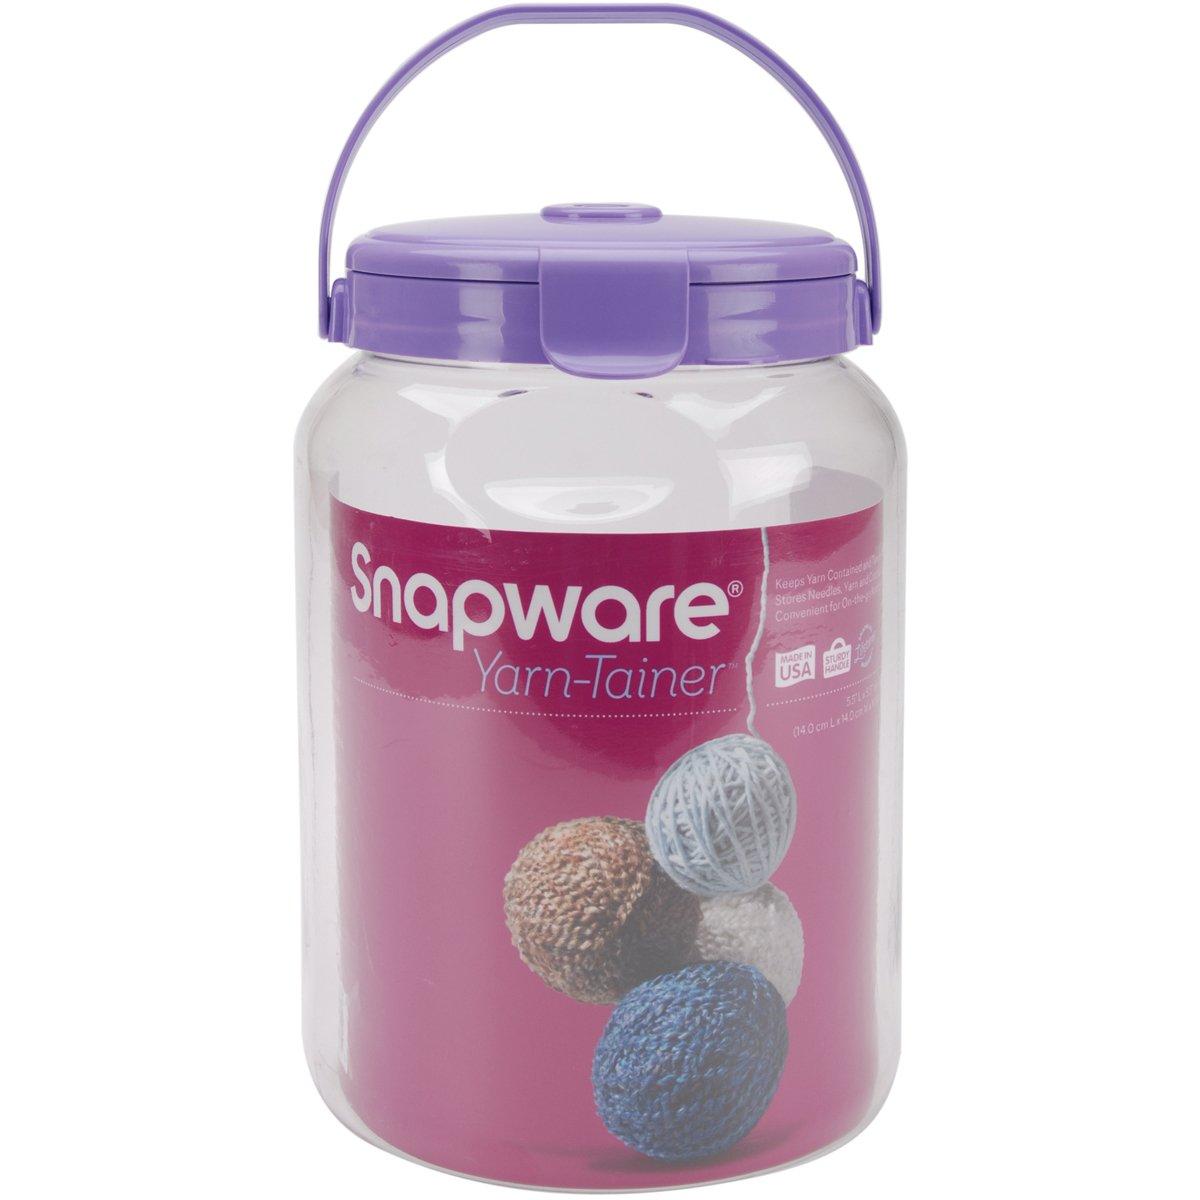 Snapware Yarn Tainer Small-8-Inchx5.5-Inch Clear 1098520